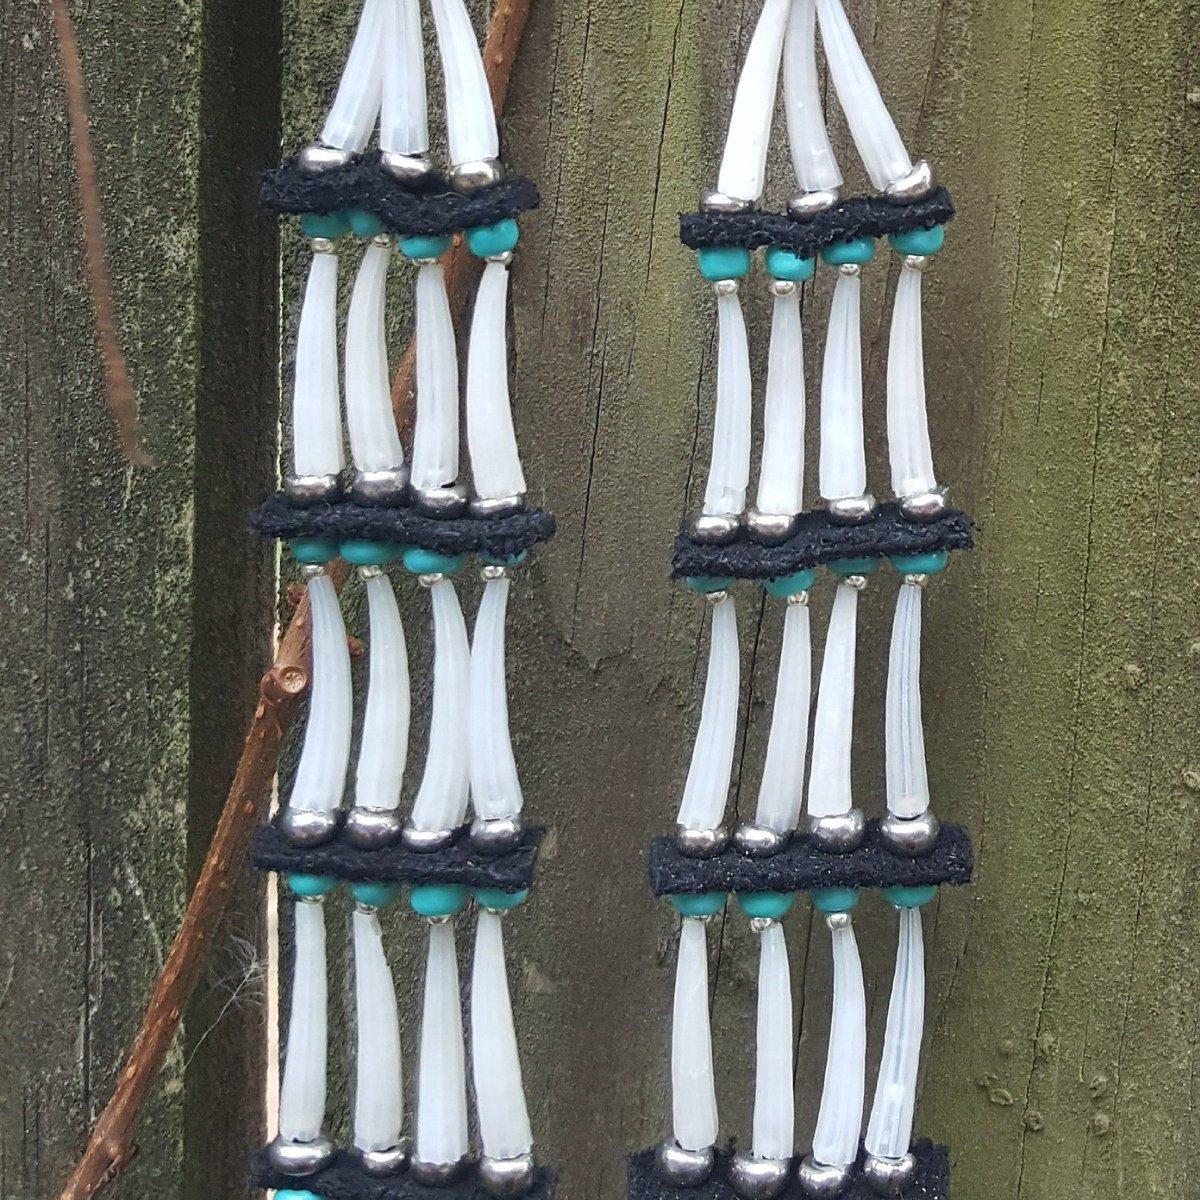 Please check out my Etsy shop! #beadwork #NativeTwitter #AlaskaNative #FirstNations #Statimc #Unangax #Aleut #NativeMade #BuyNative  https://buff.ly/33jBE9fpic.twitter.com/UoihsJEjoI